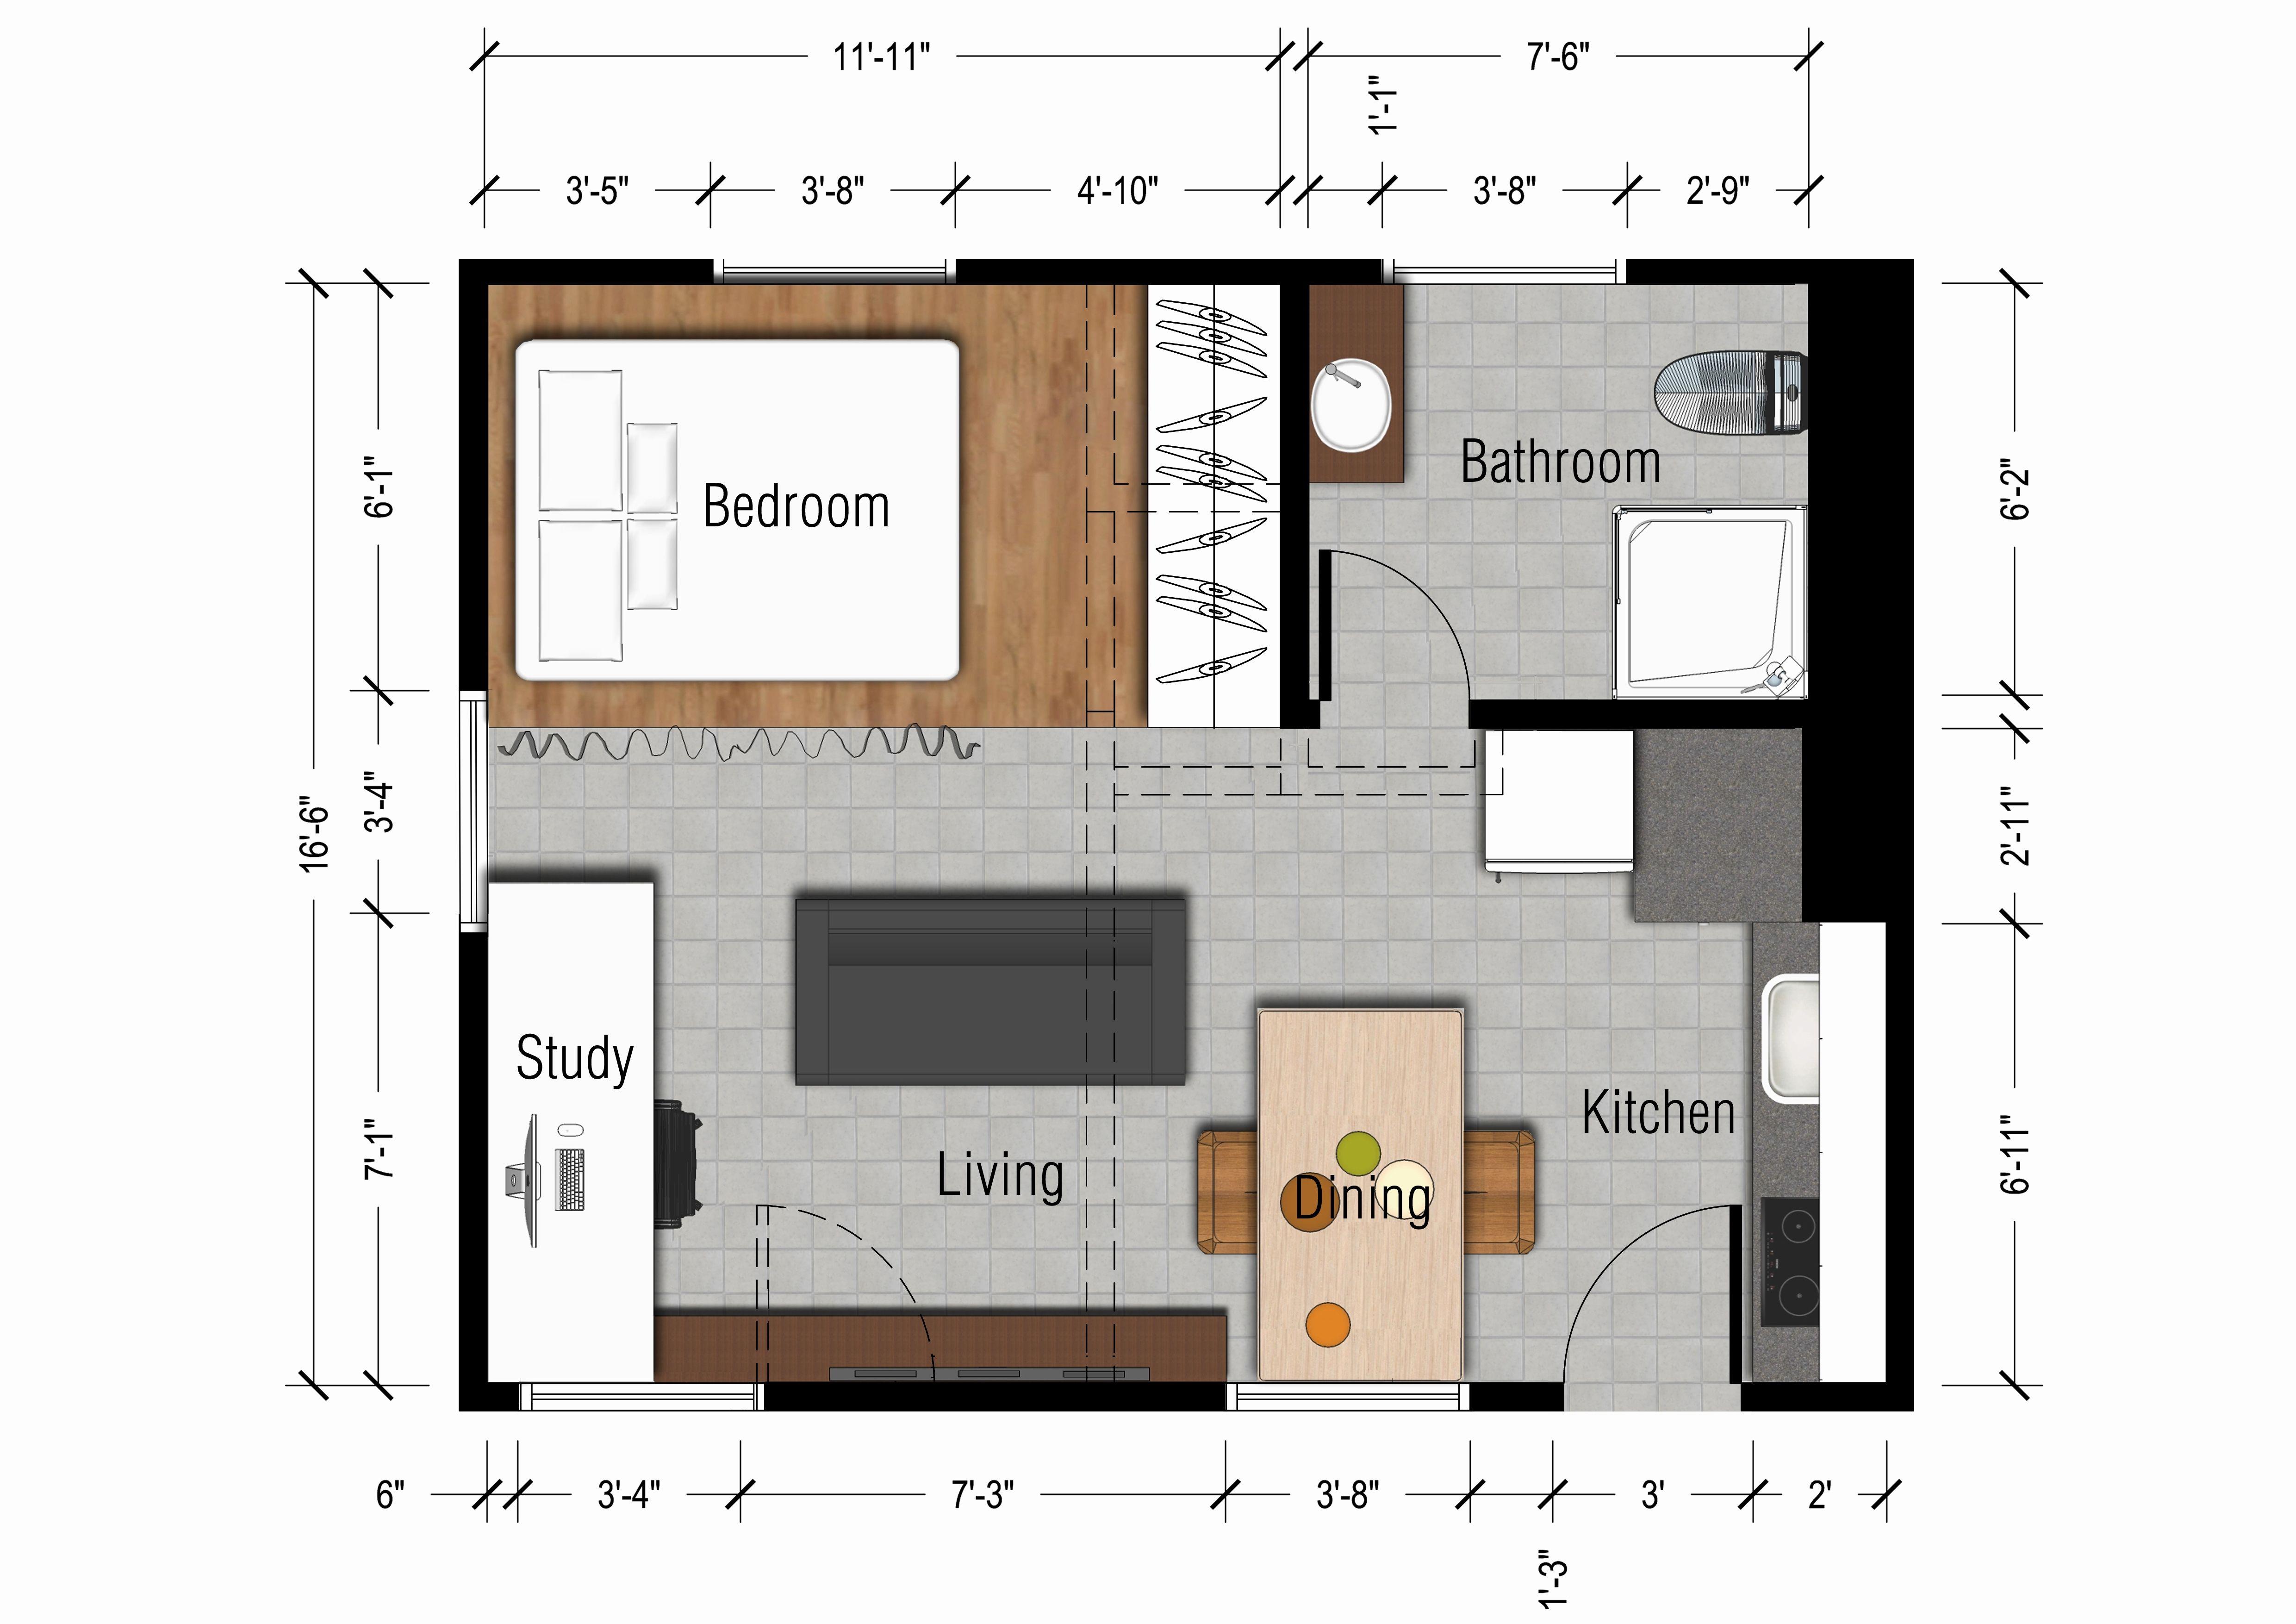 350 Sq Ft Floor Plans Lovely Studio Apartments 300 Square Feet Floor Plan Small Apartment Plans Studio Apartment Floor Plans Studio Apartment Plan